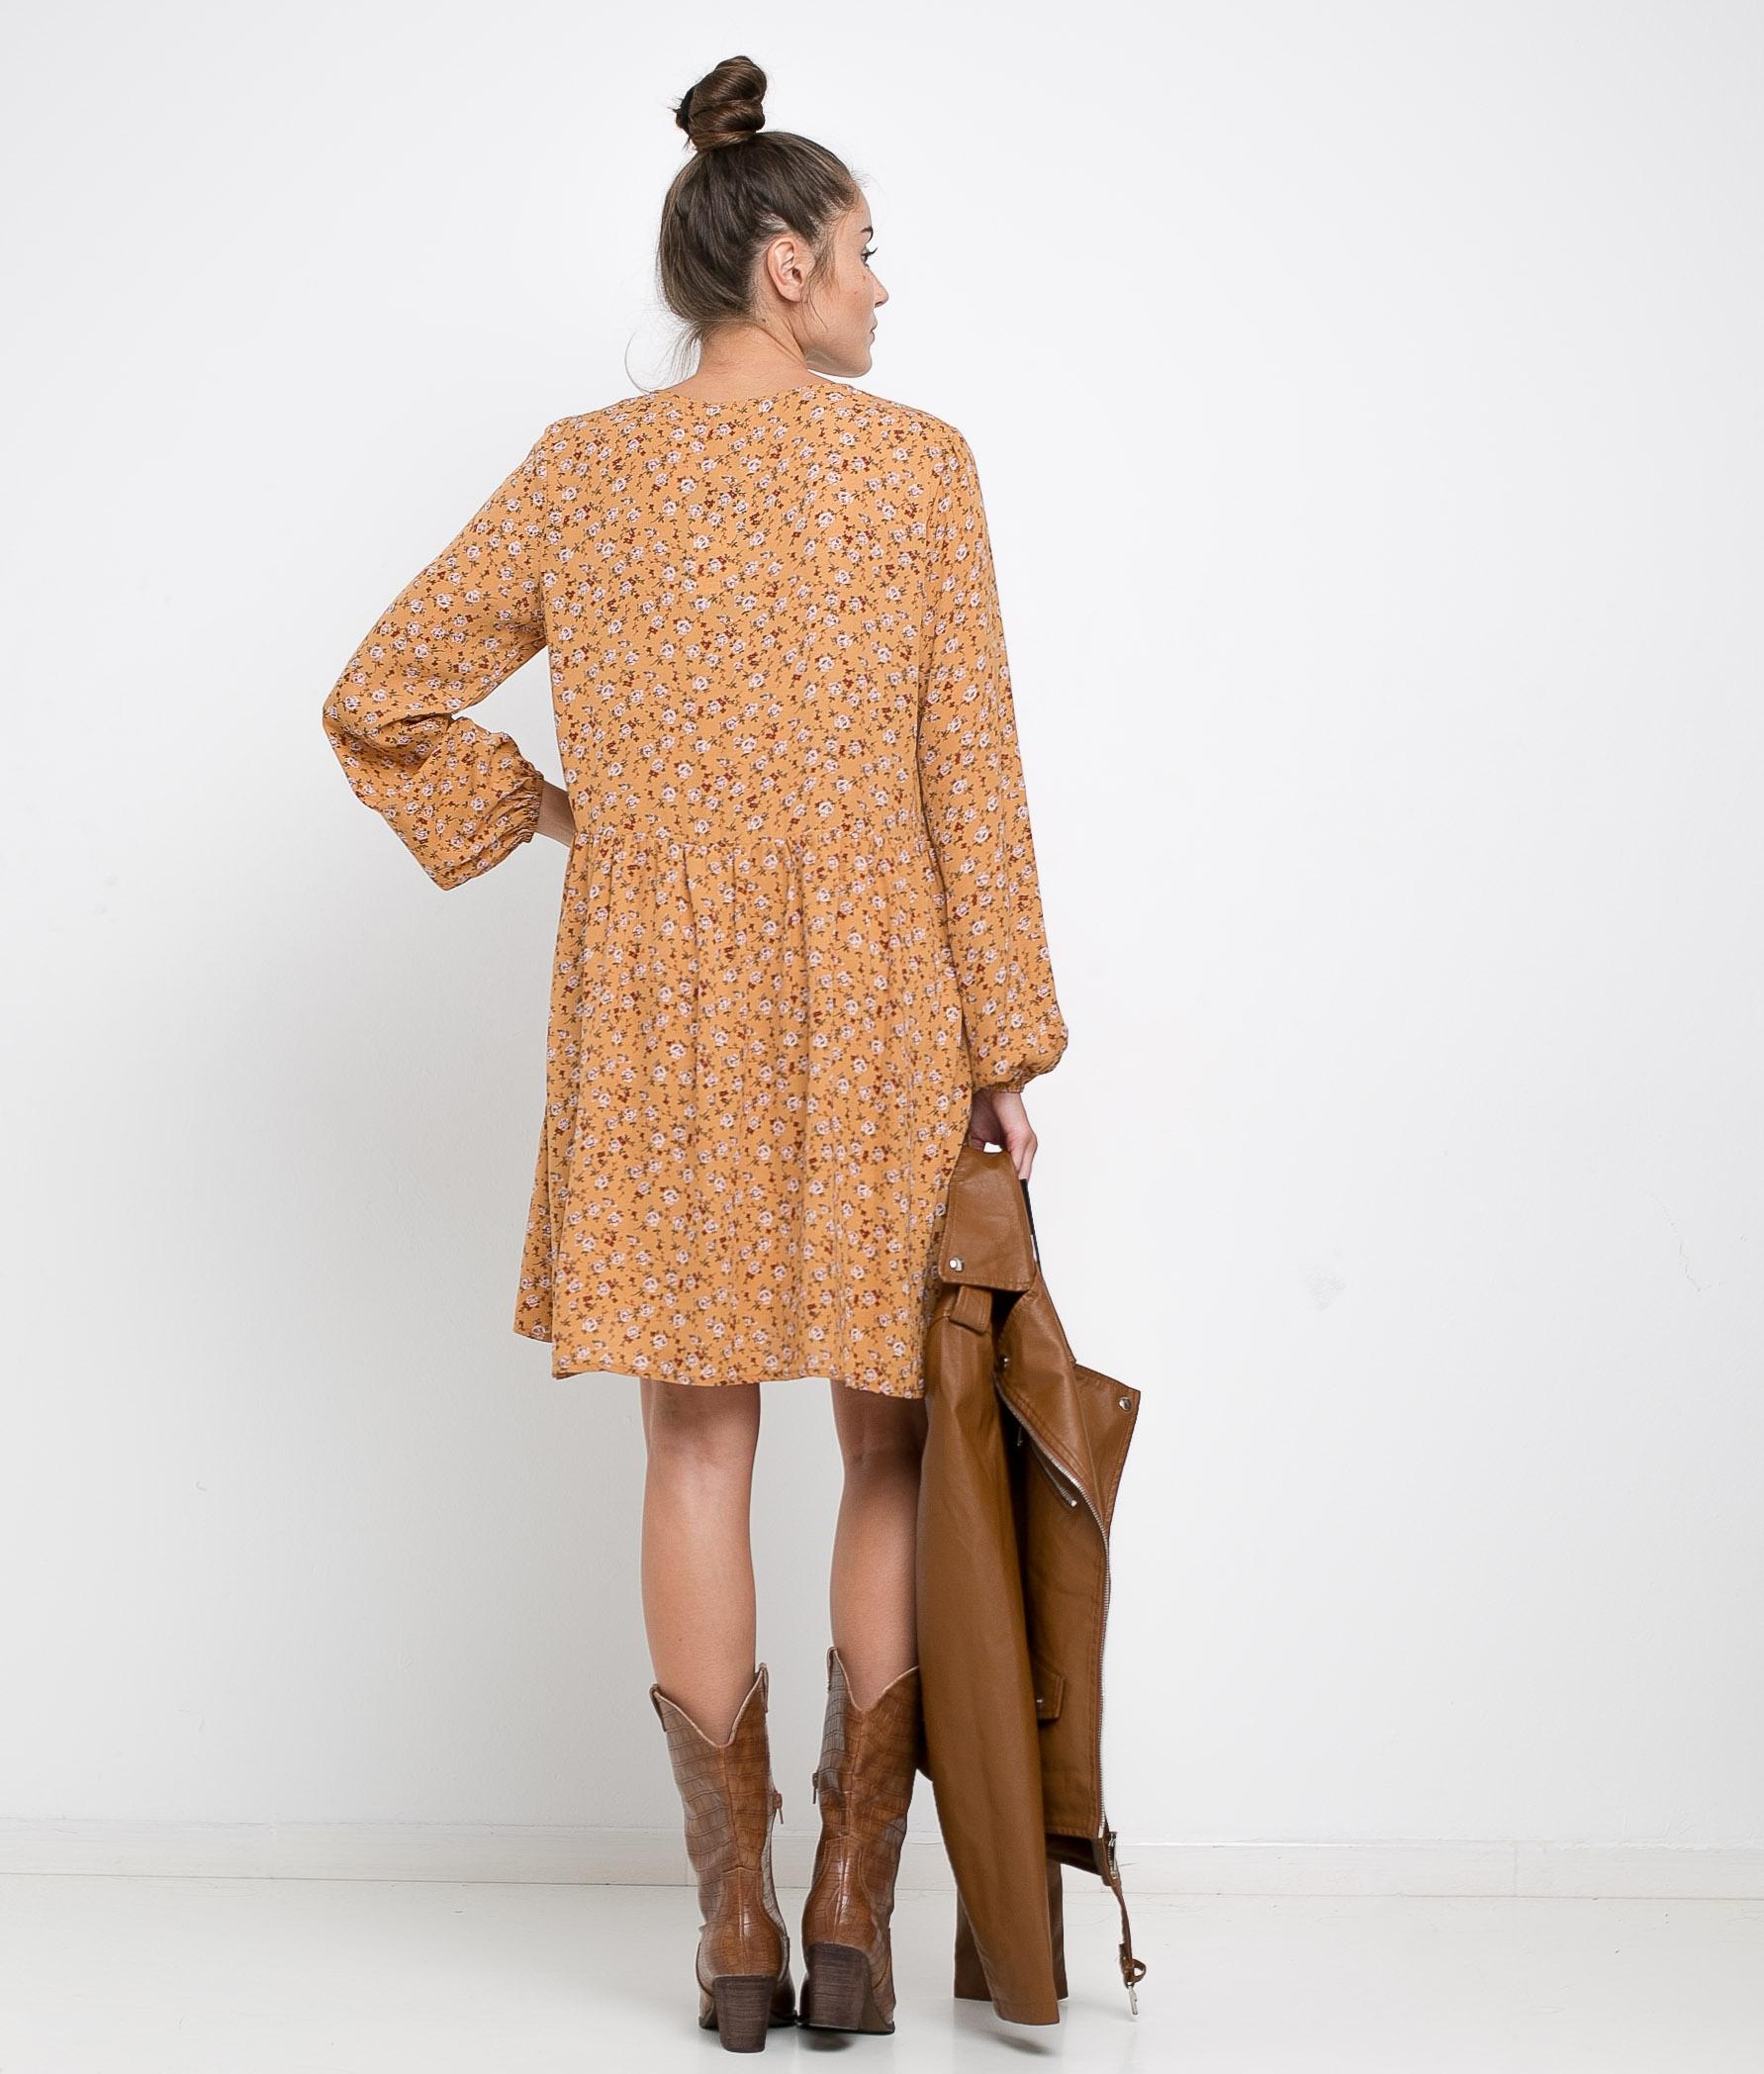 DRESS HALIN - YELLOW